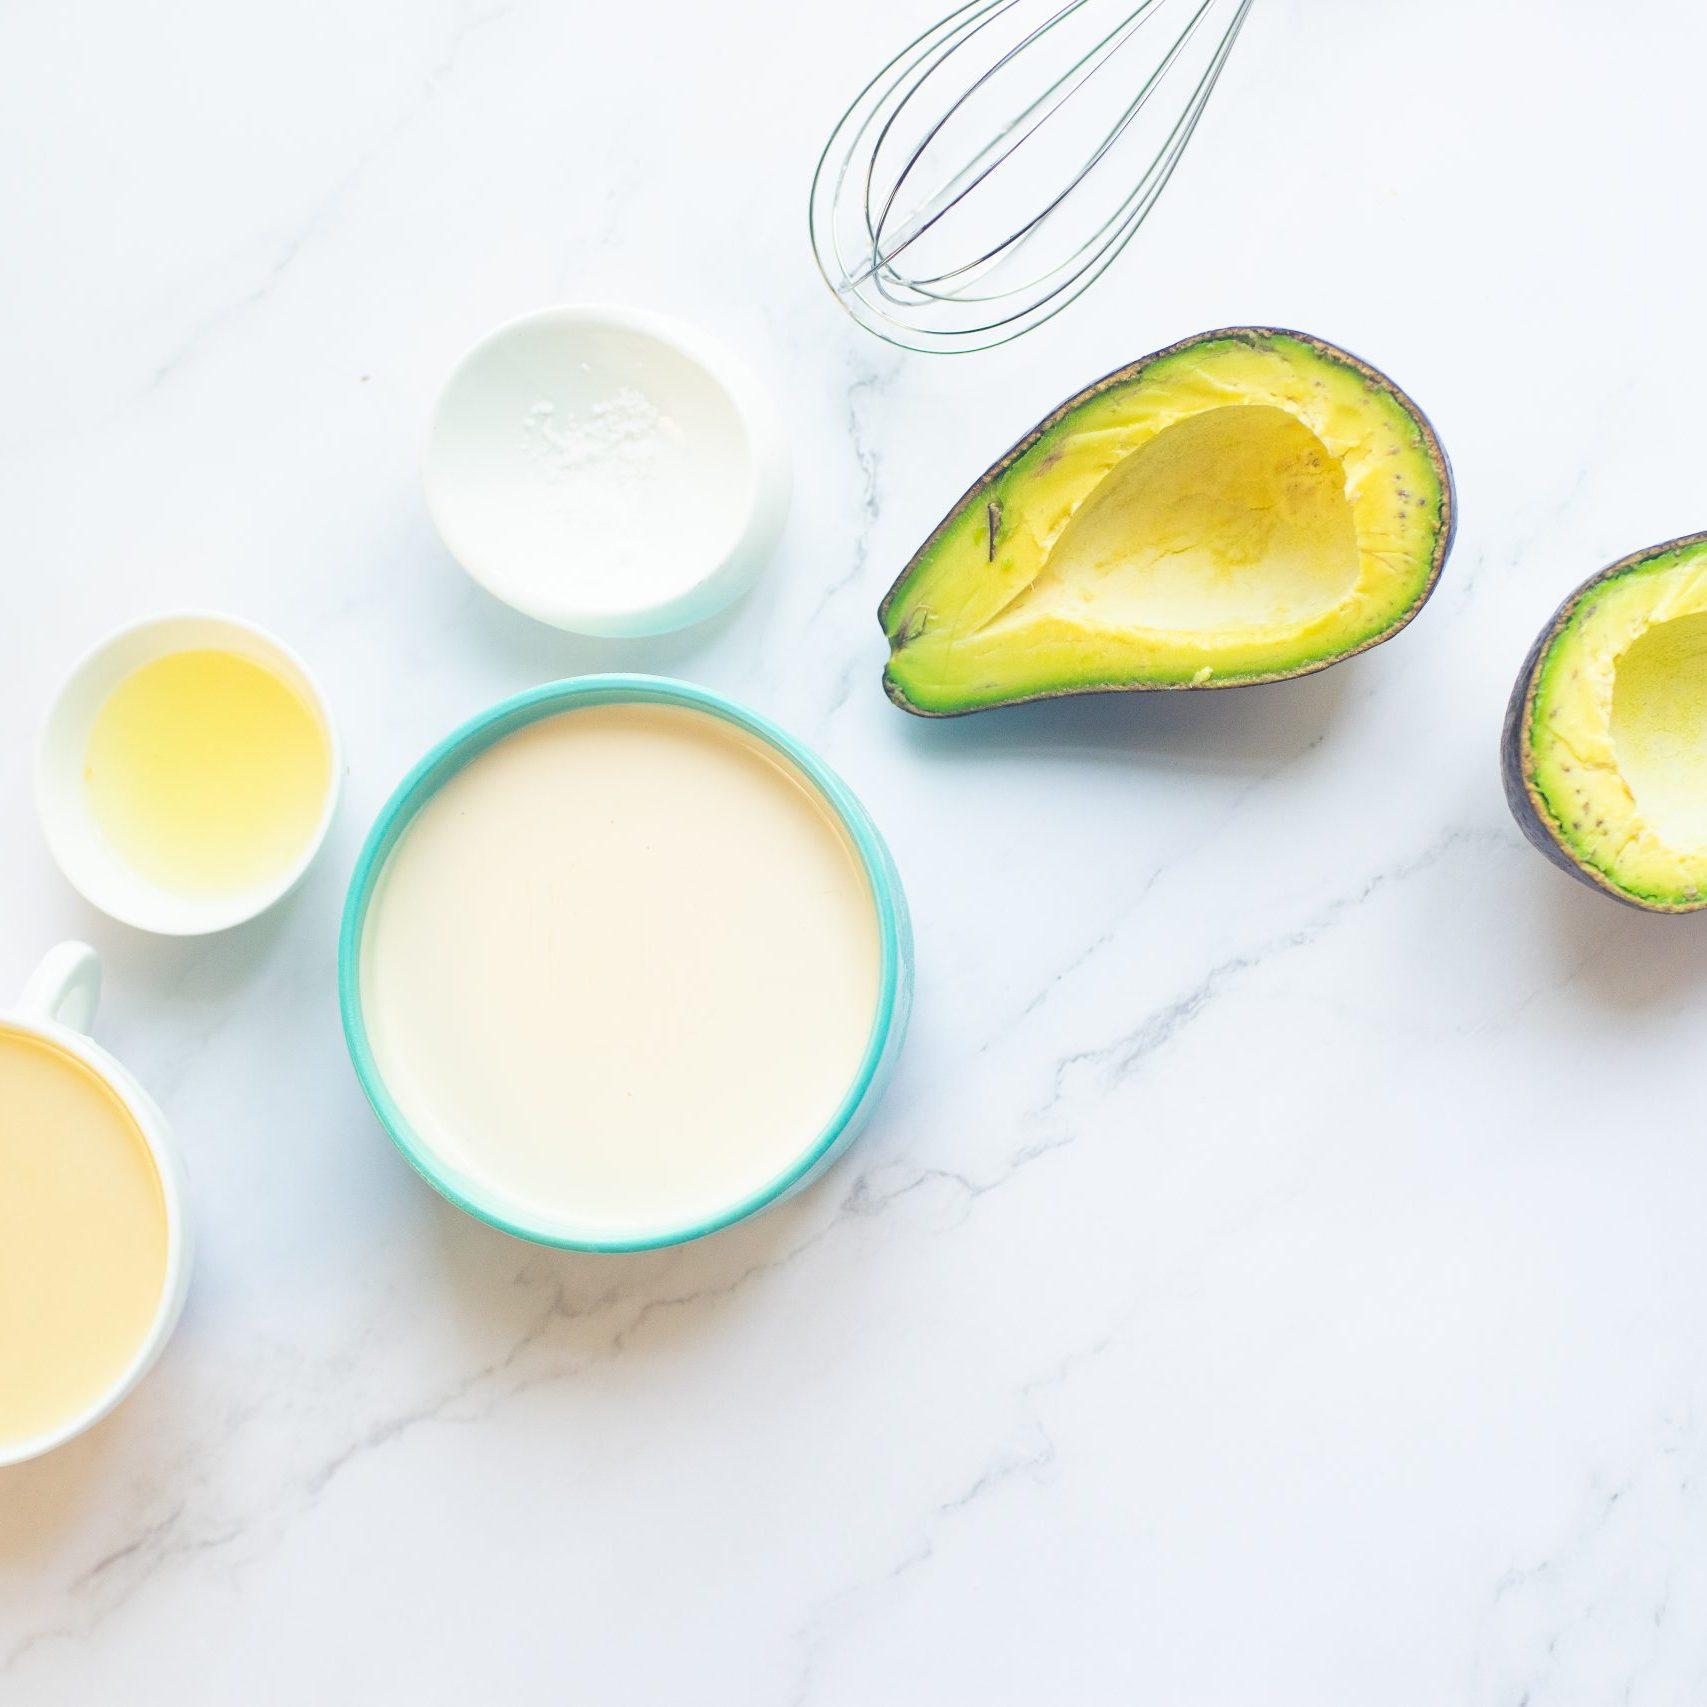 picture of cream, avocado, sugar, condensed milk on a table